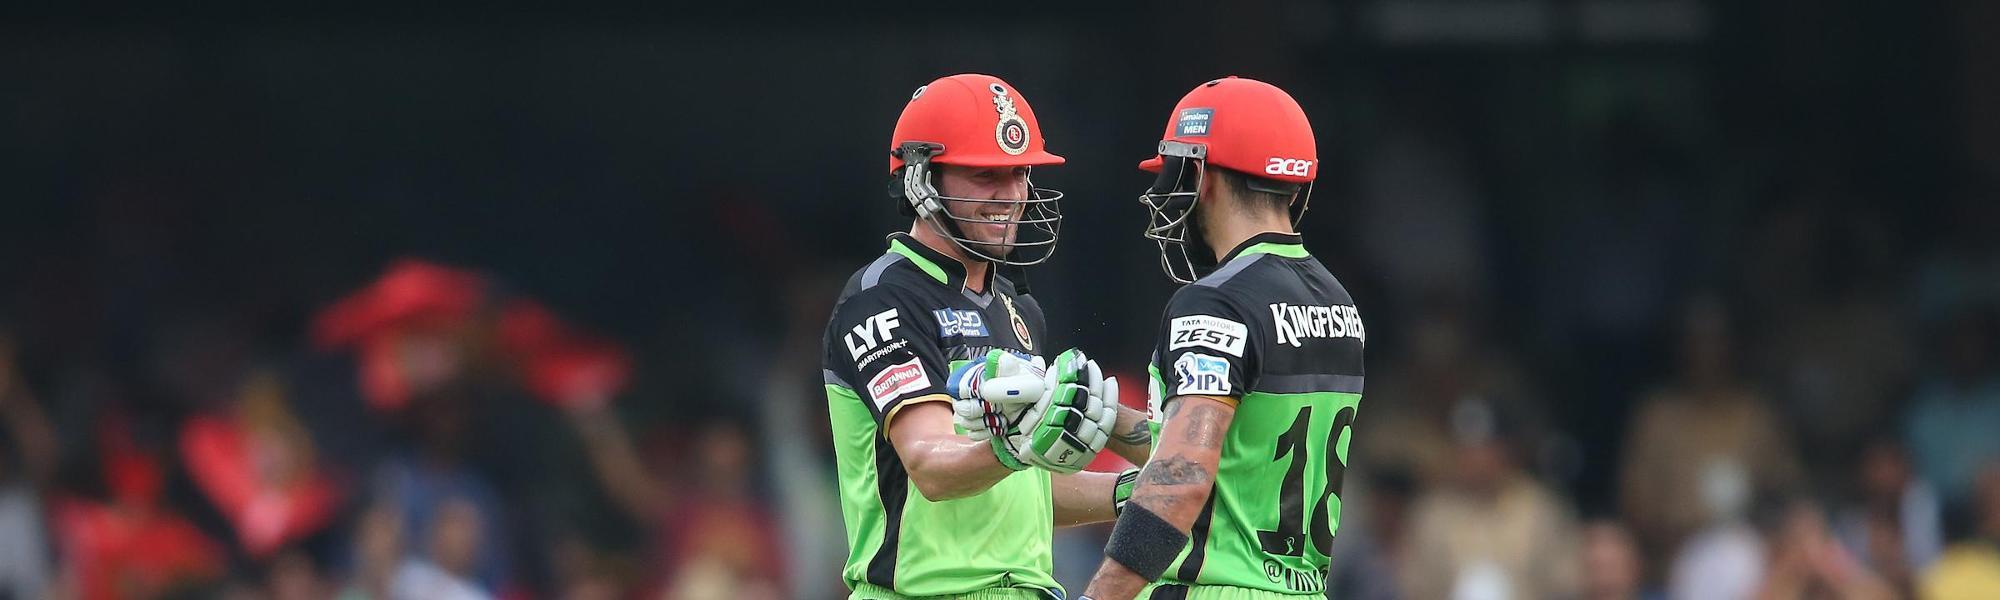 De Villiers scored 129* in 52 balls as he and Virat Kohli (109) added 229 runs together in an IPL 2016 match